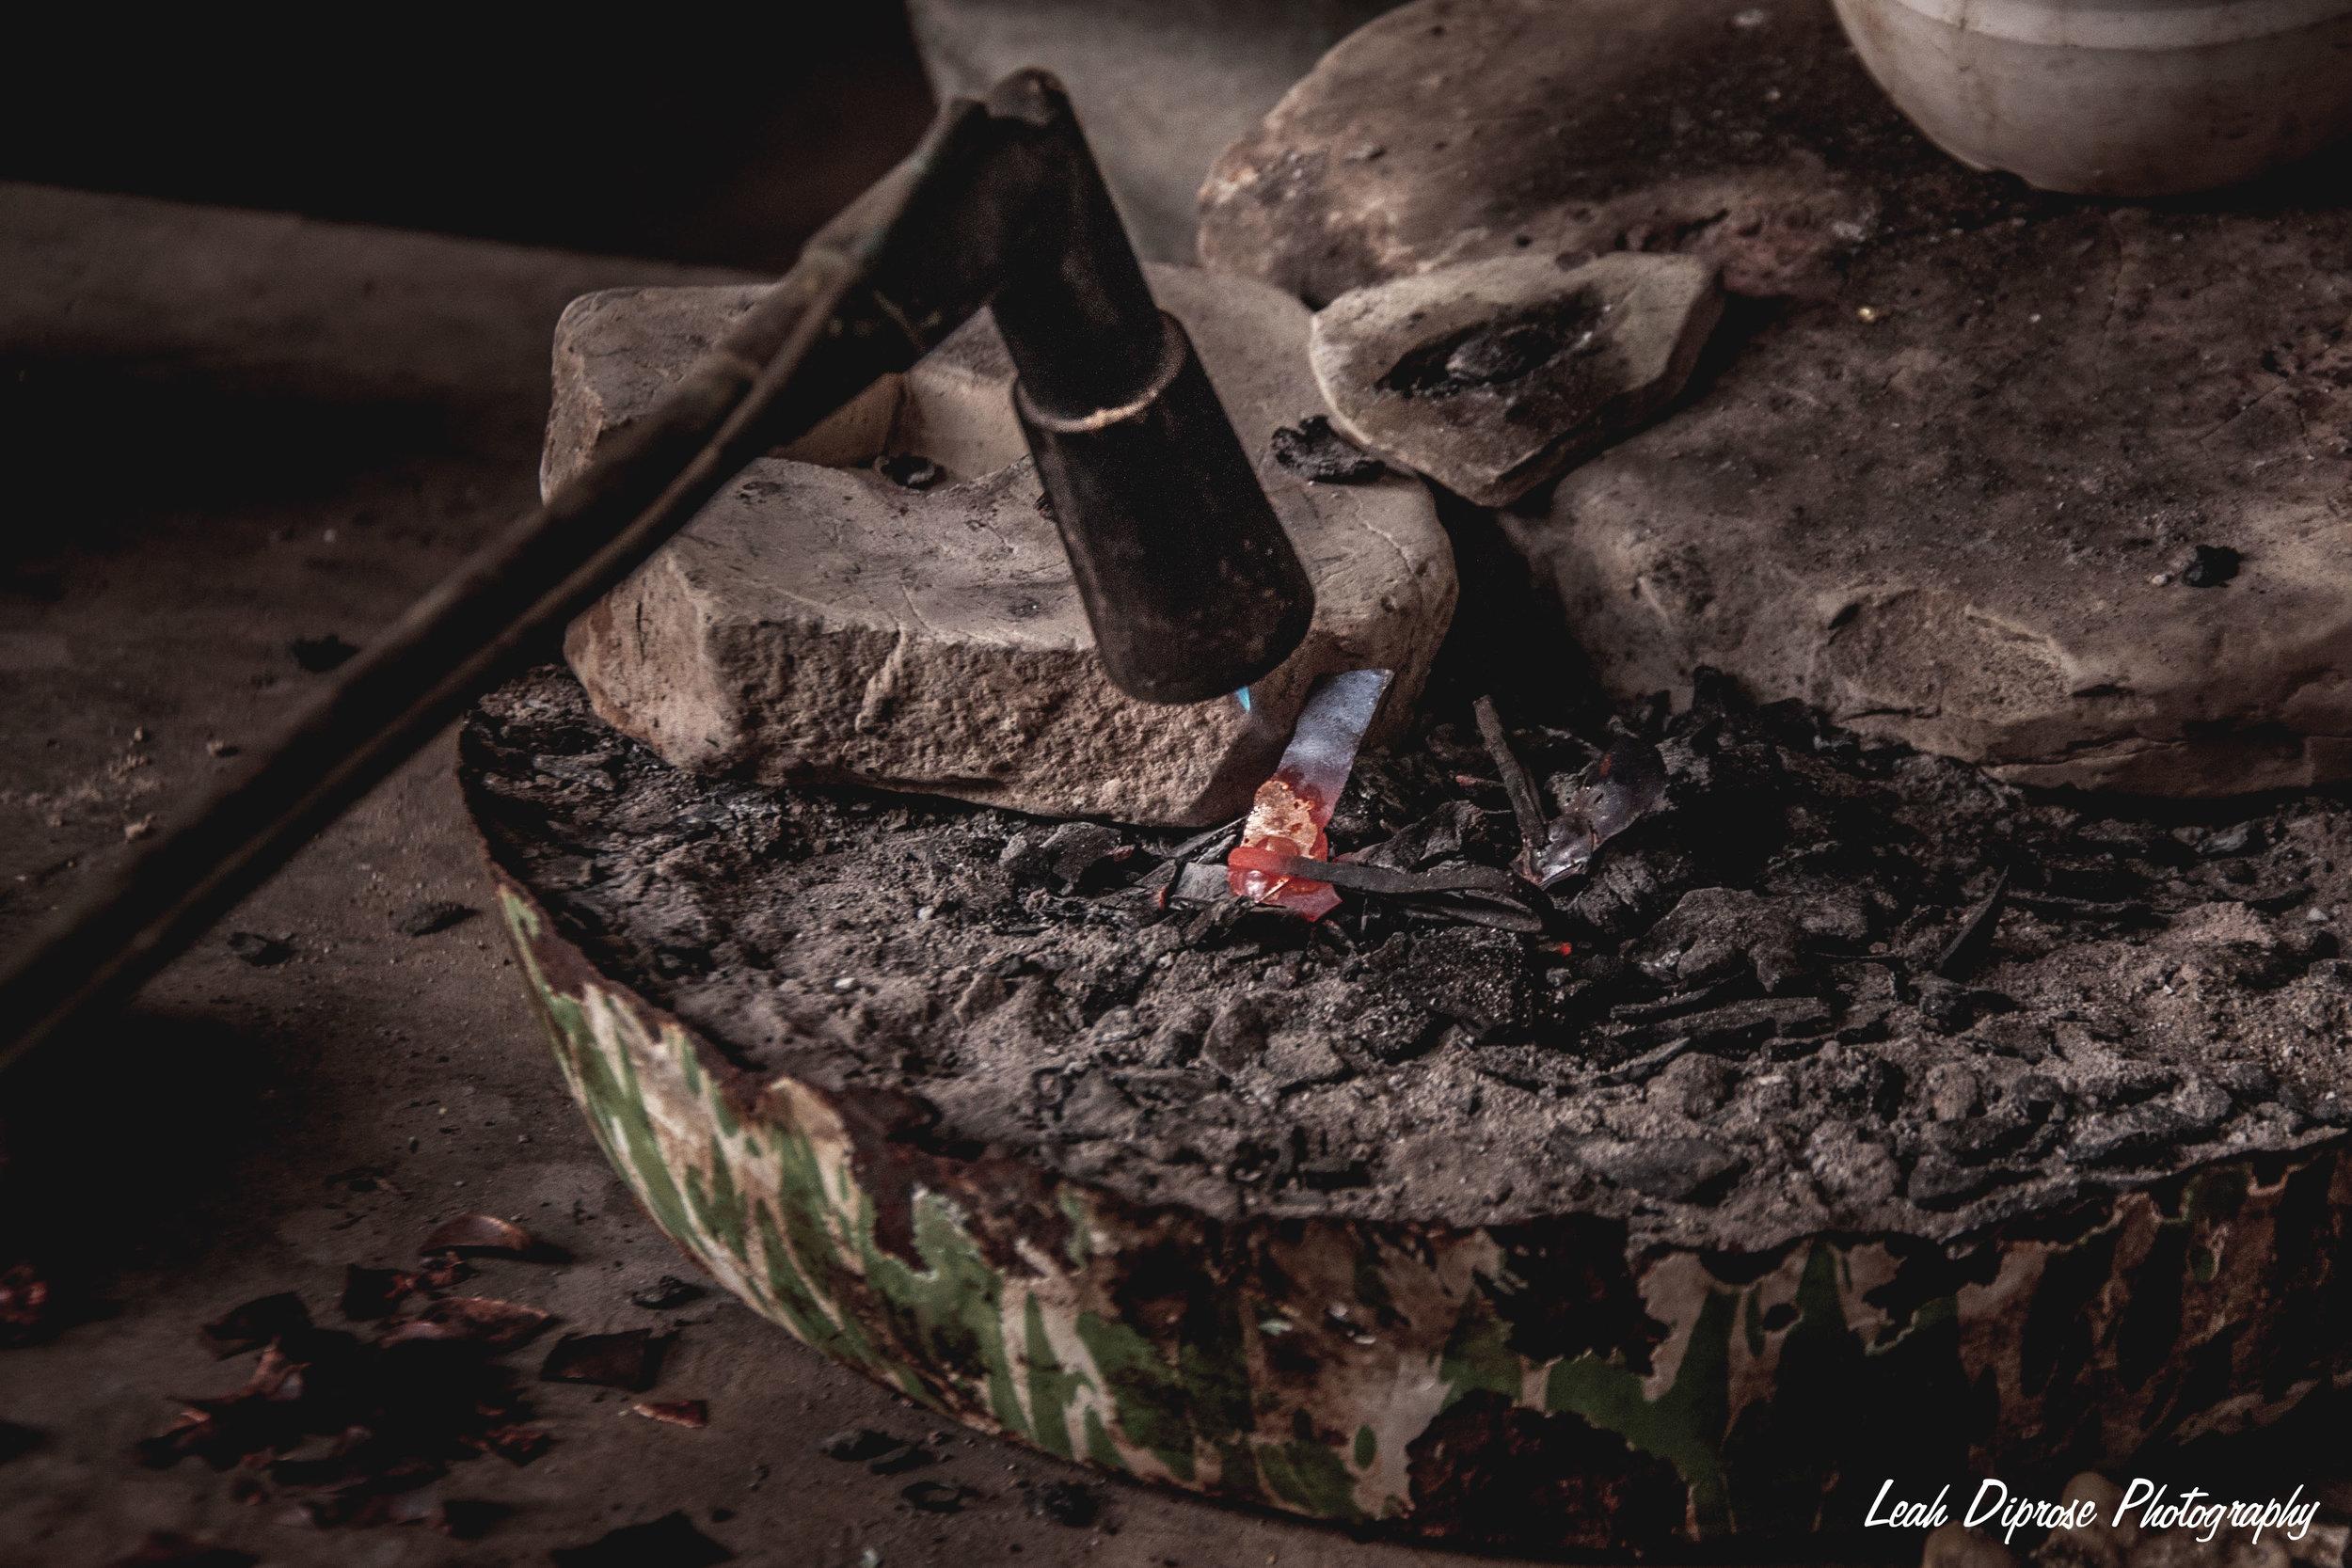 Leah Diprose Photography image-5033.jpg